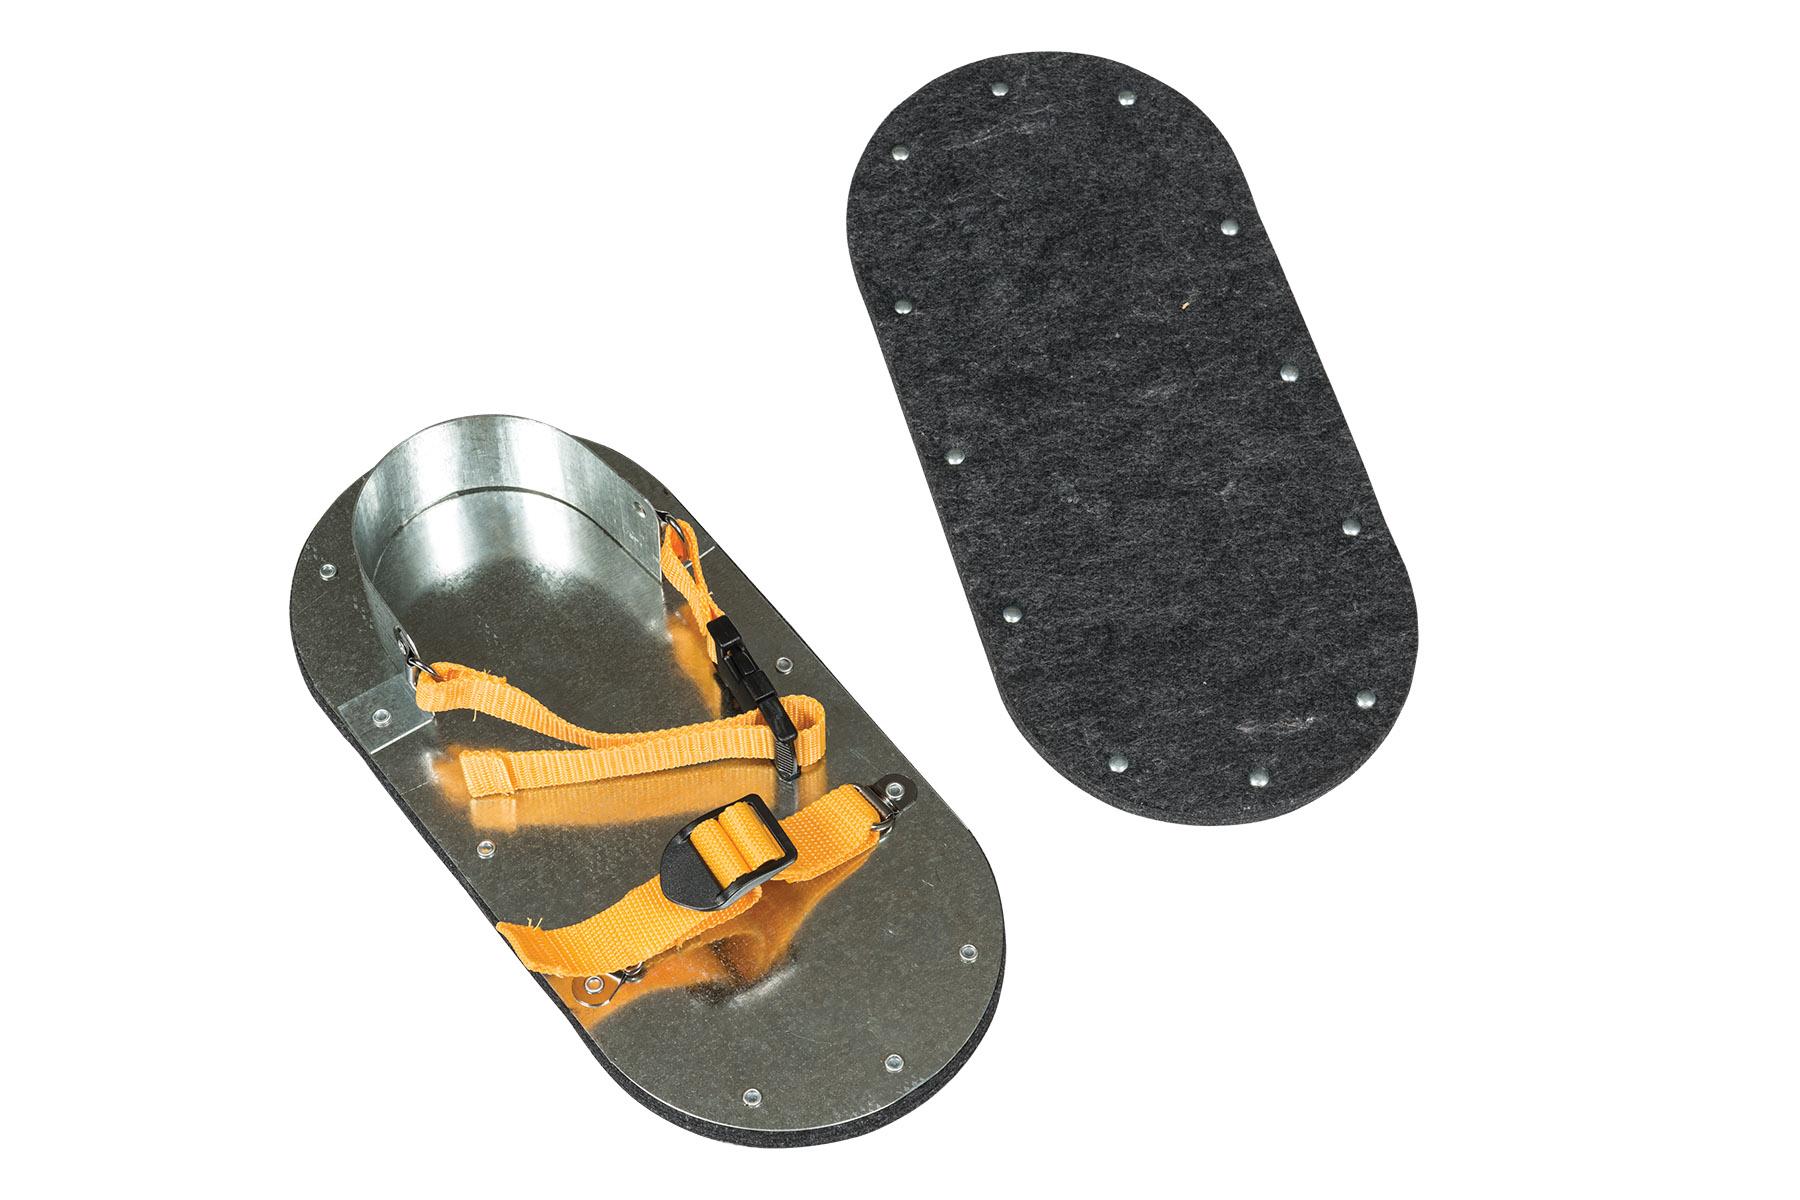 Asphalt Shoes Felt Soled Pair